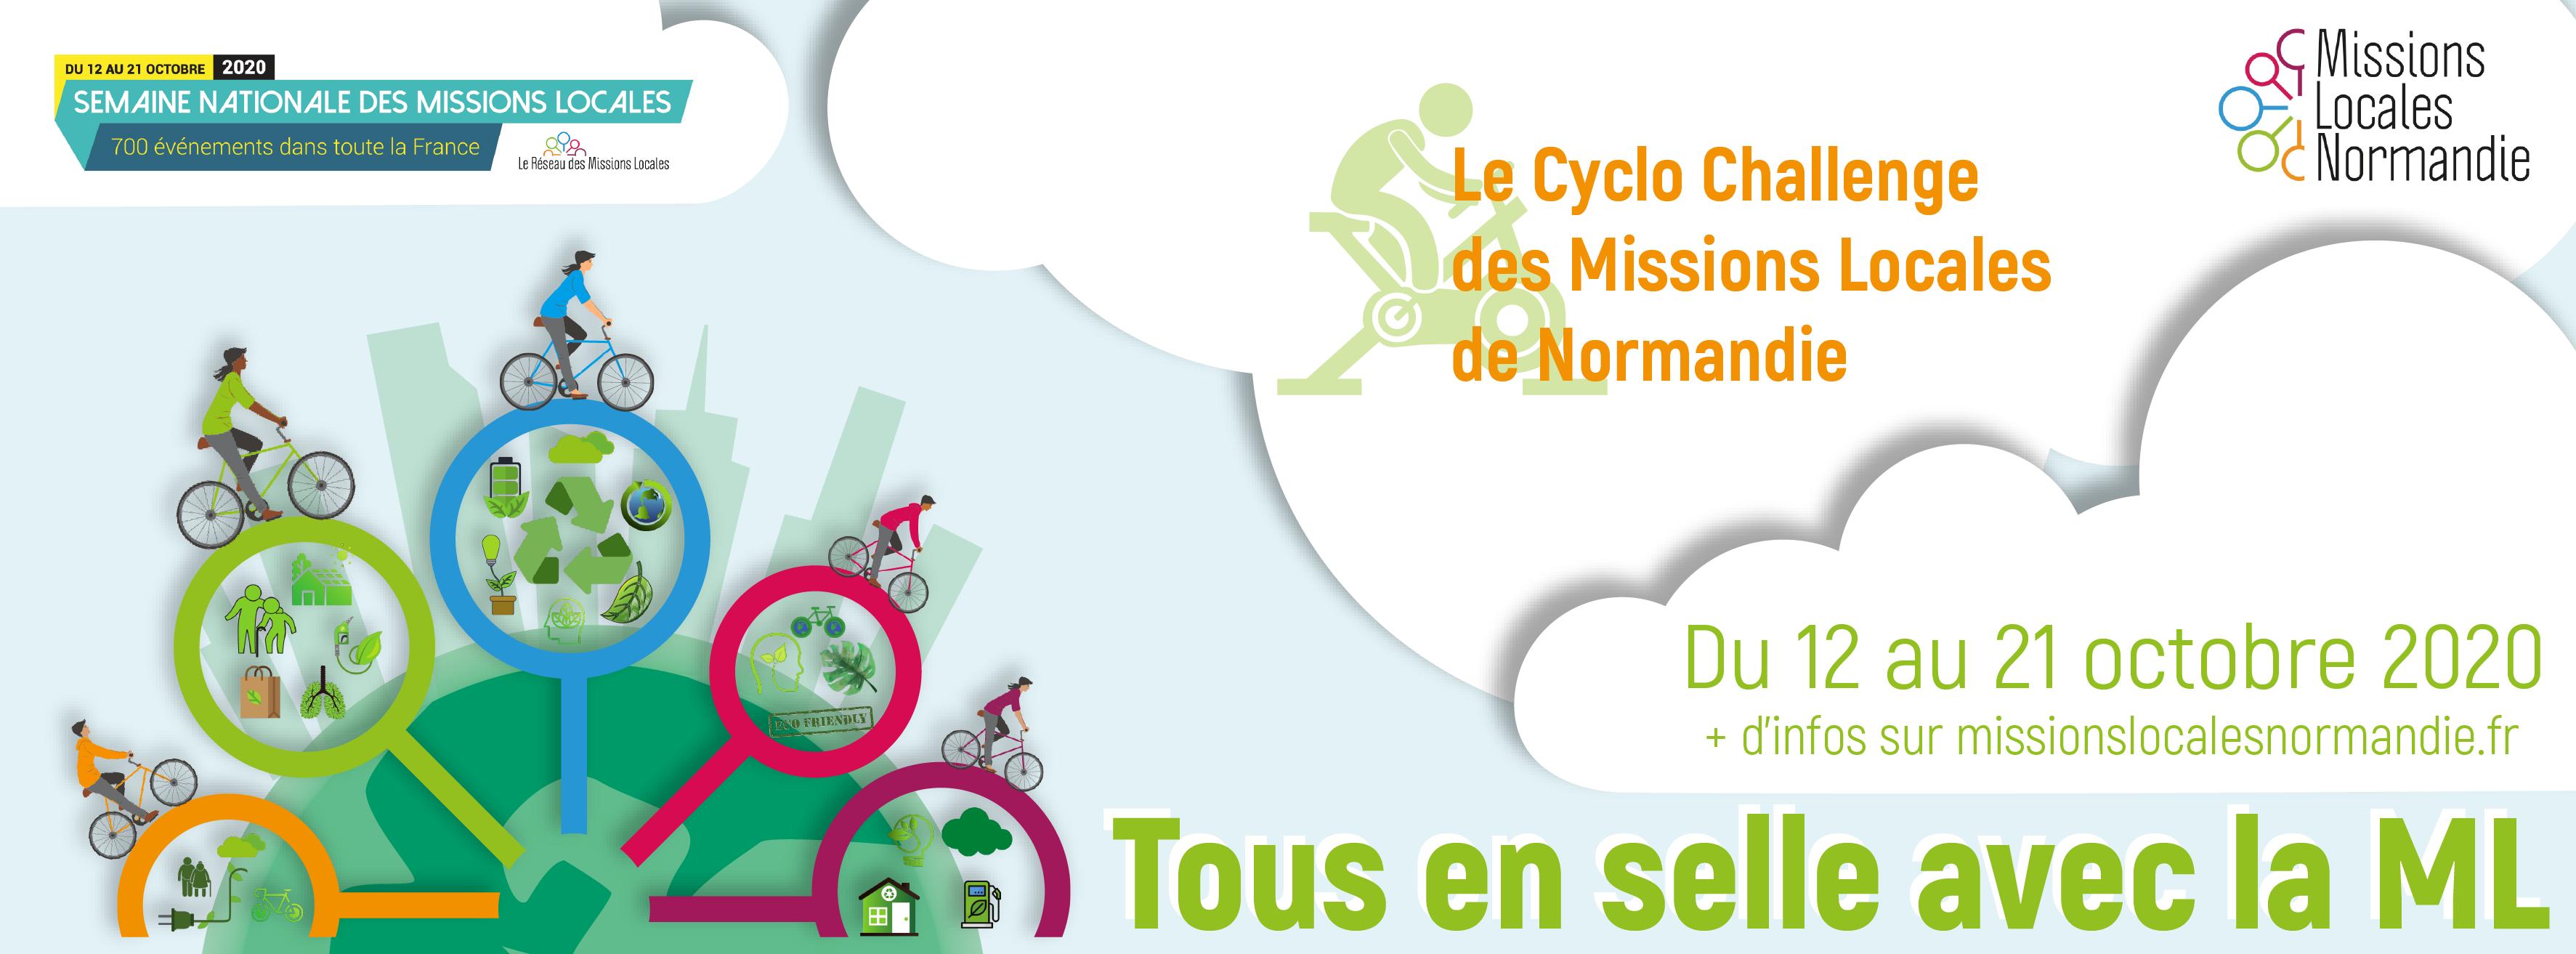 SEMAINE NATIONALE DES MISSIONS LOCALES et CYCLO CHALLENGE ML NORMANDIE